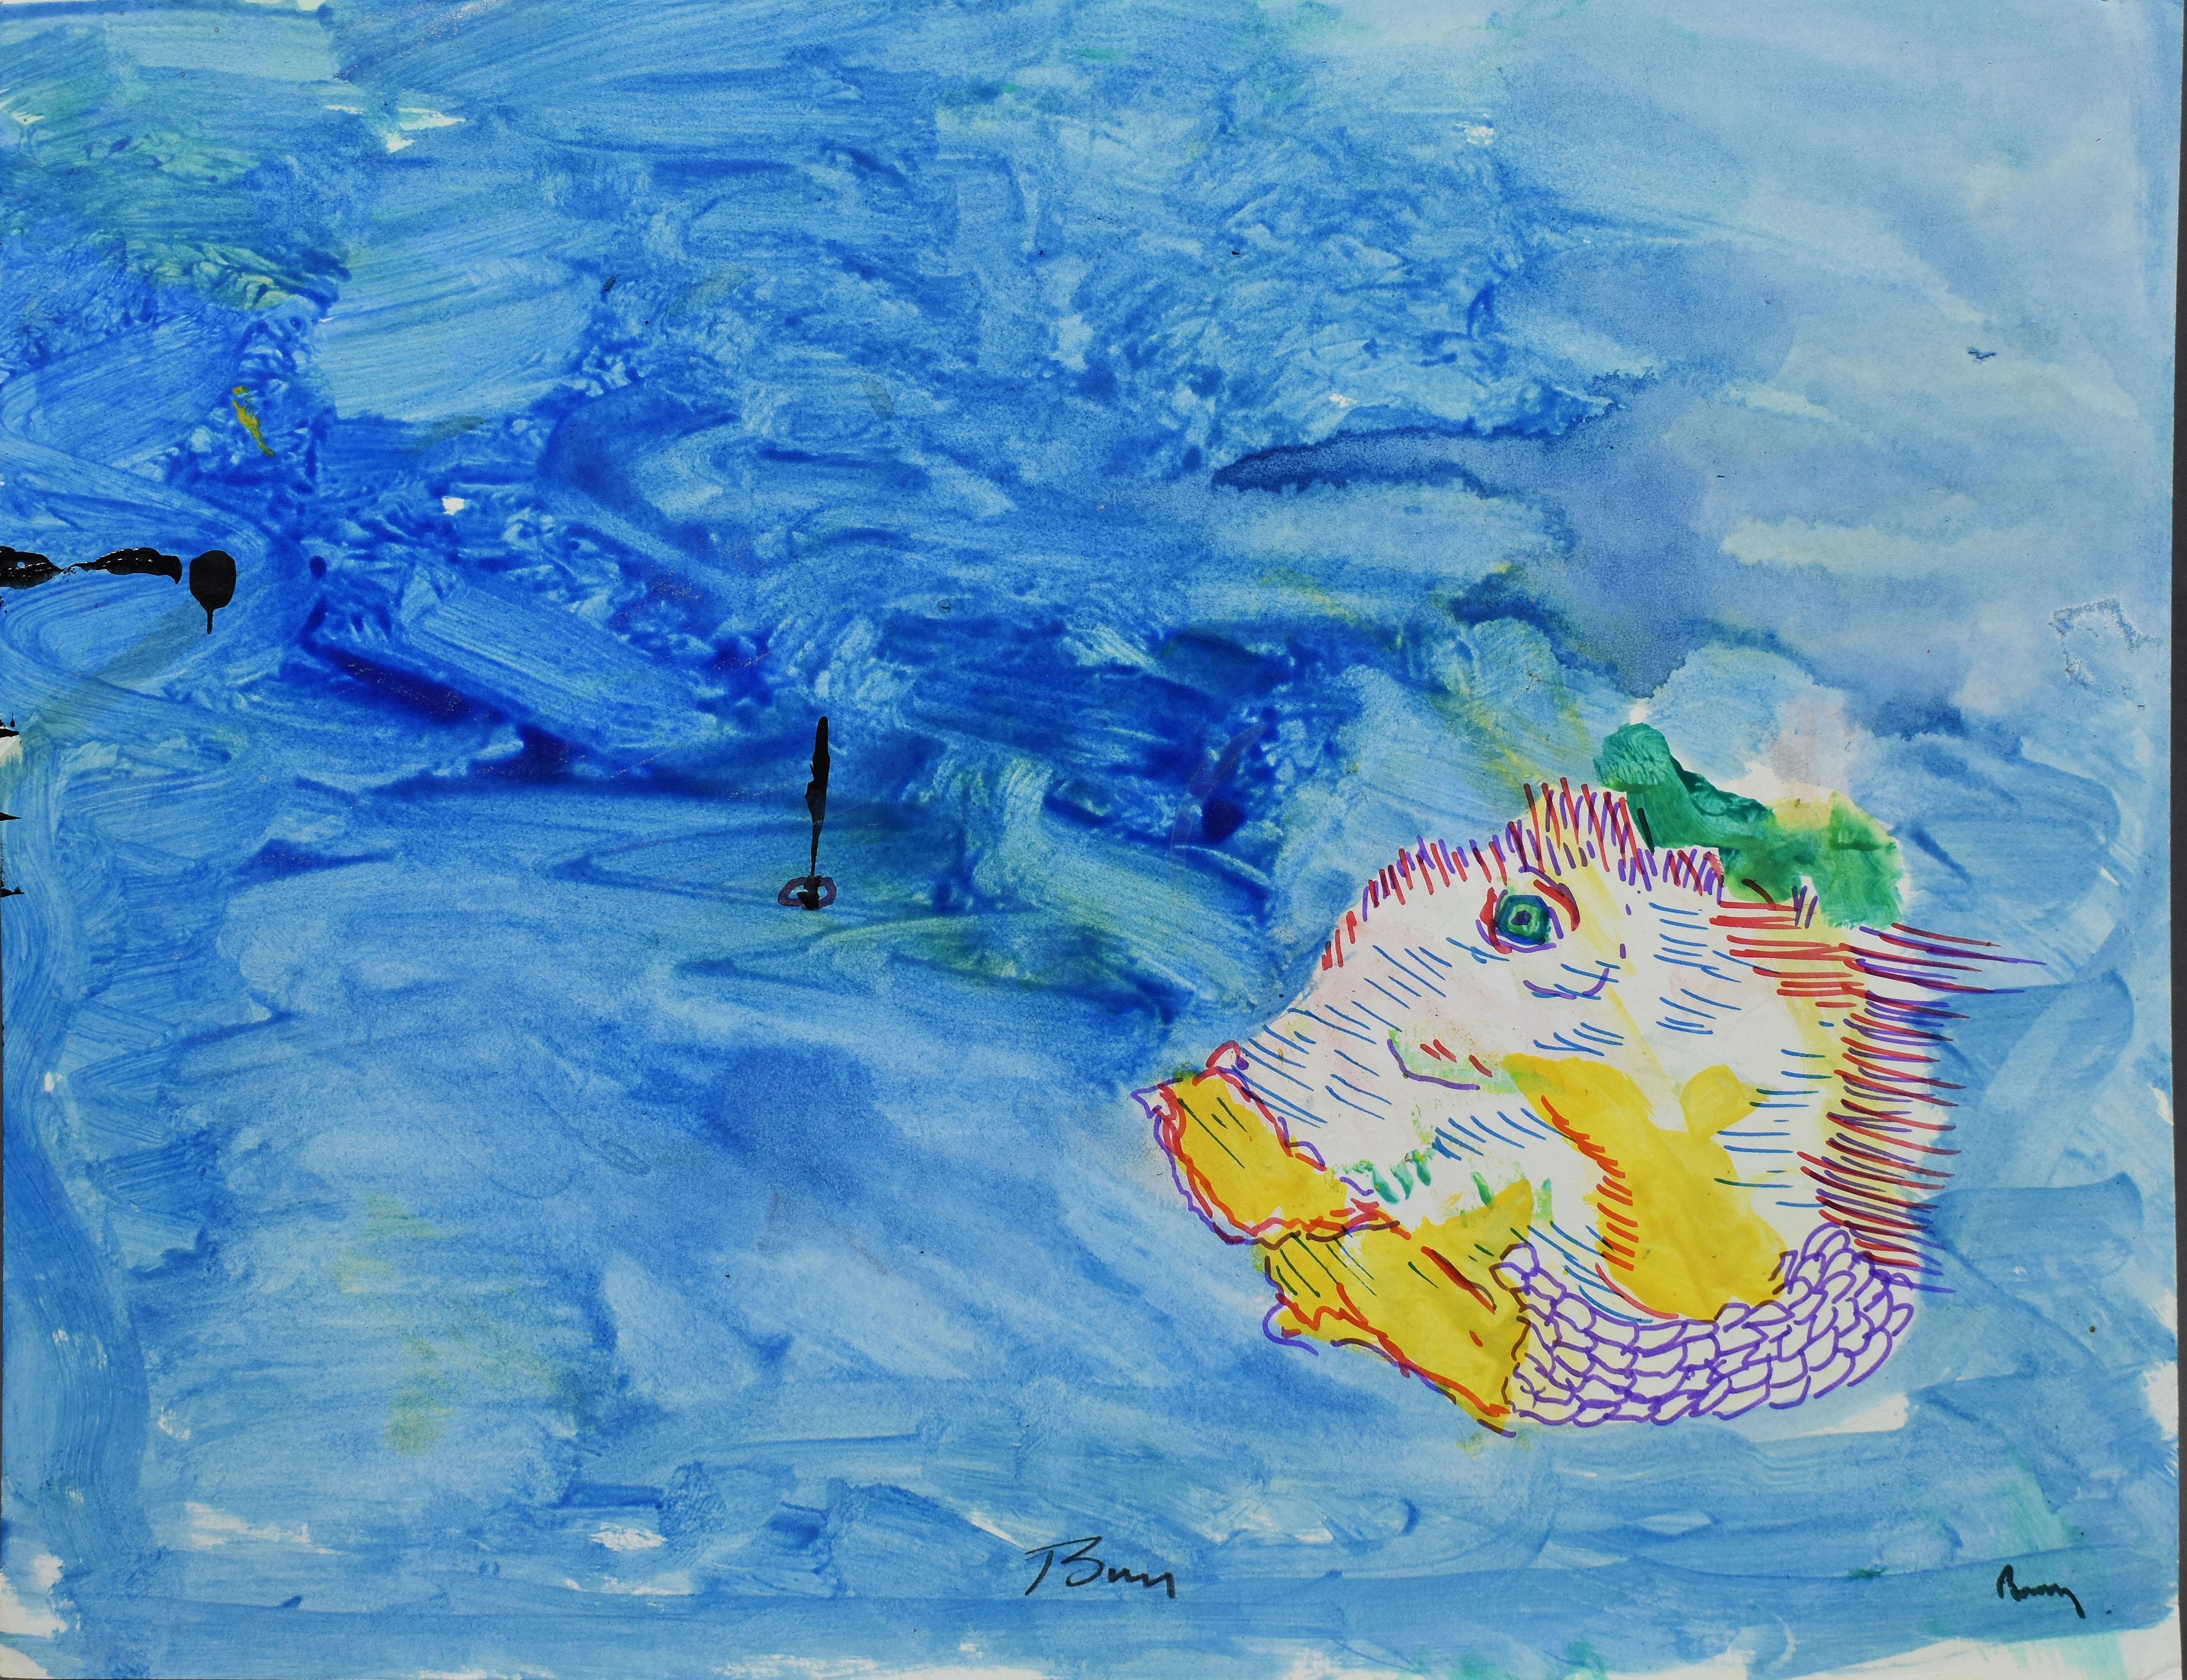 American School New York City Abstract Magic Surrealism Ocean Fish Painting